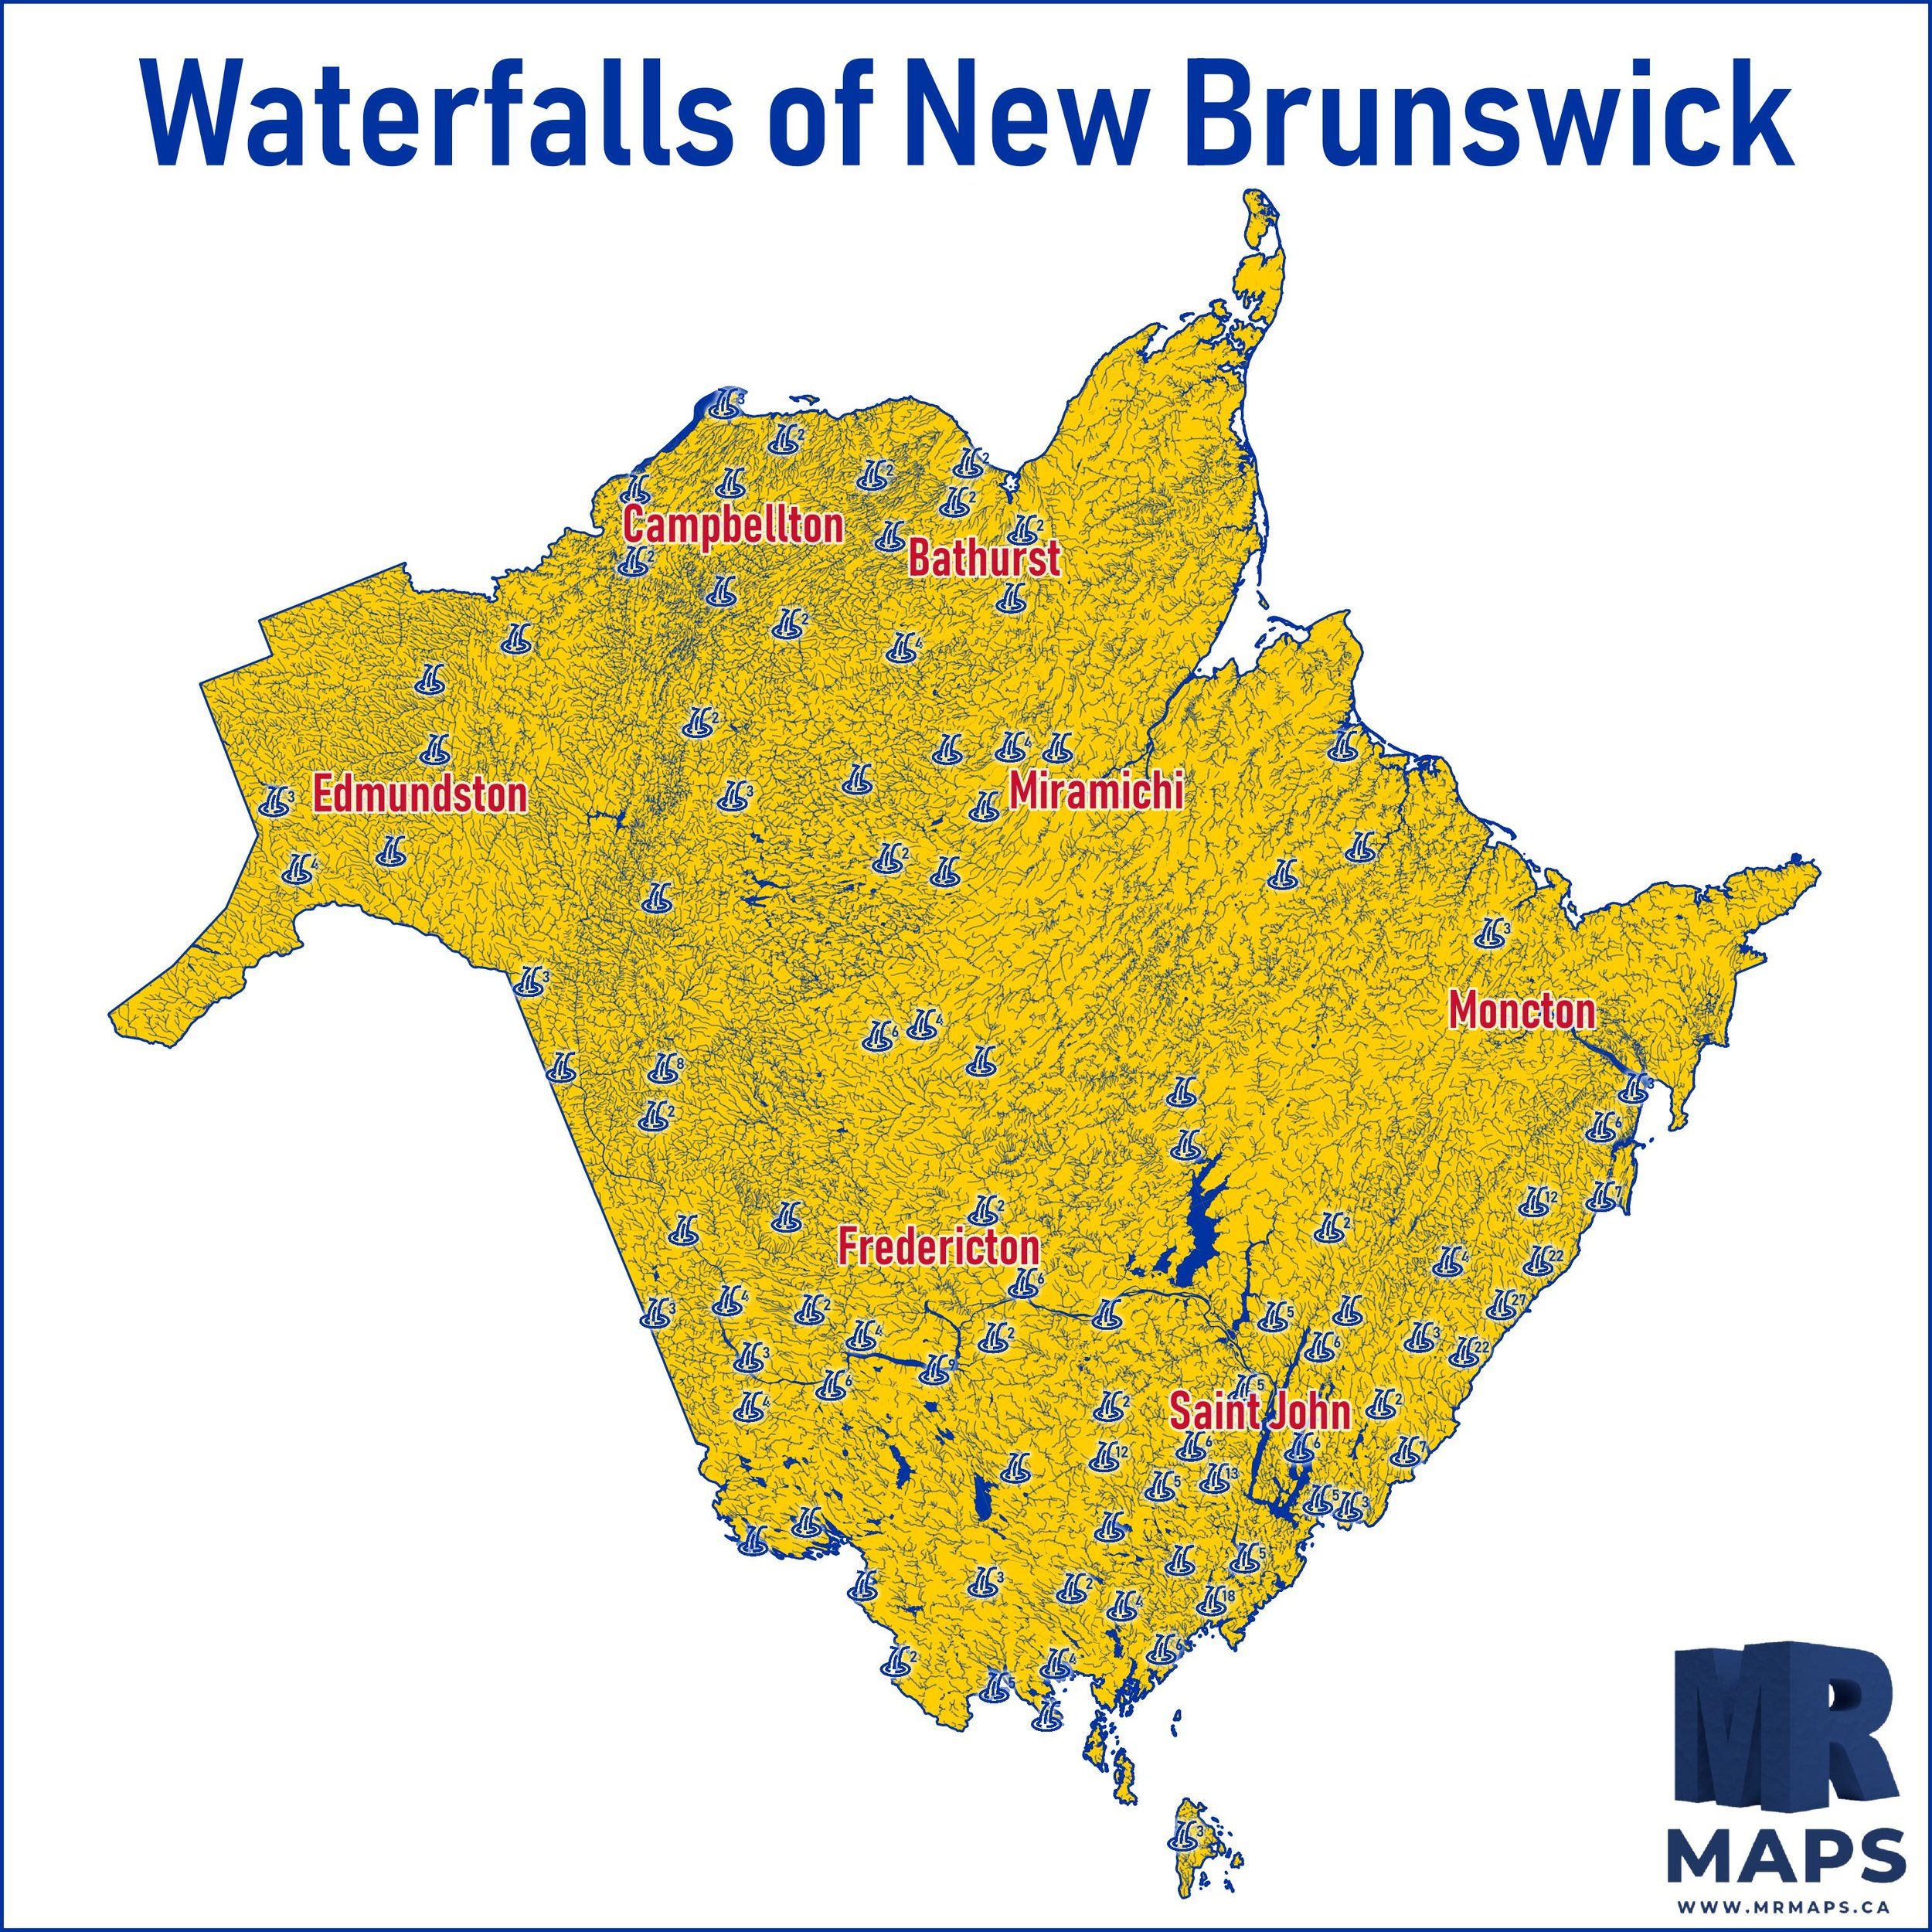 Waterfalls_of_NB_100dpi.jpg